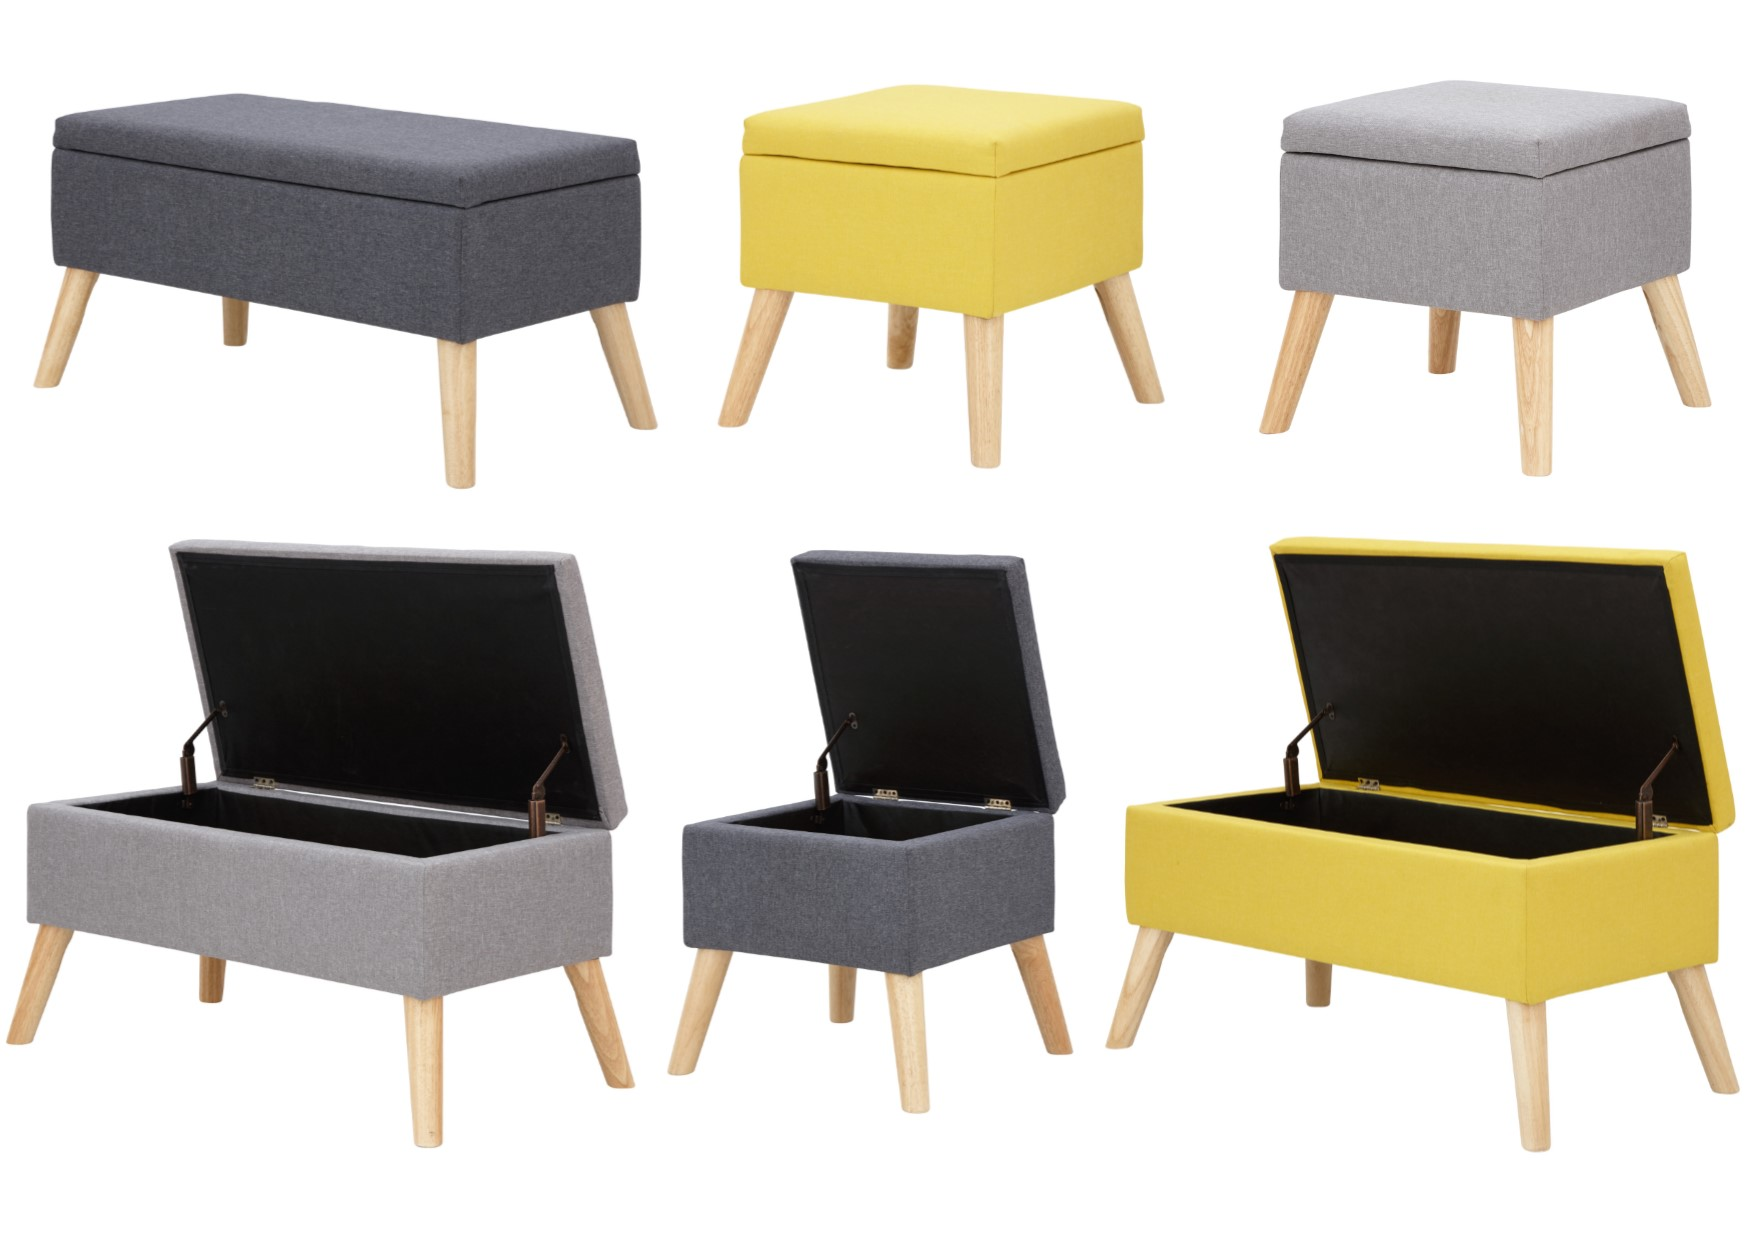 Alexandra Storage Ottoman Box Bench Small Or Large Charcoal Grey Mustard Ebay